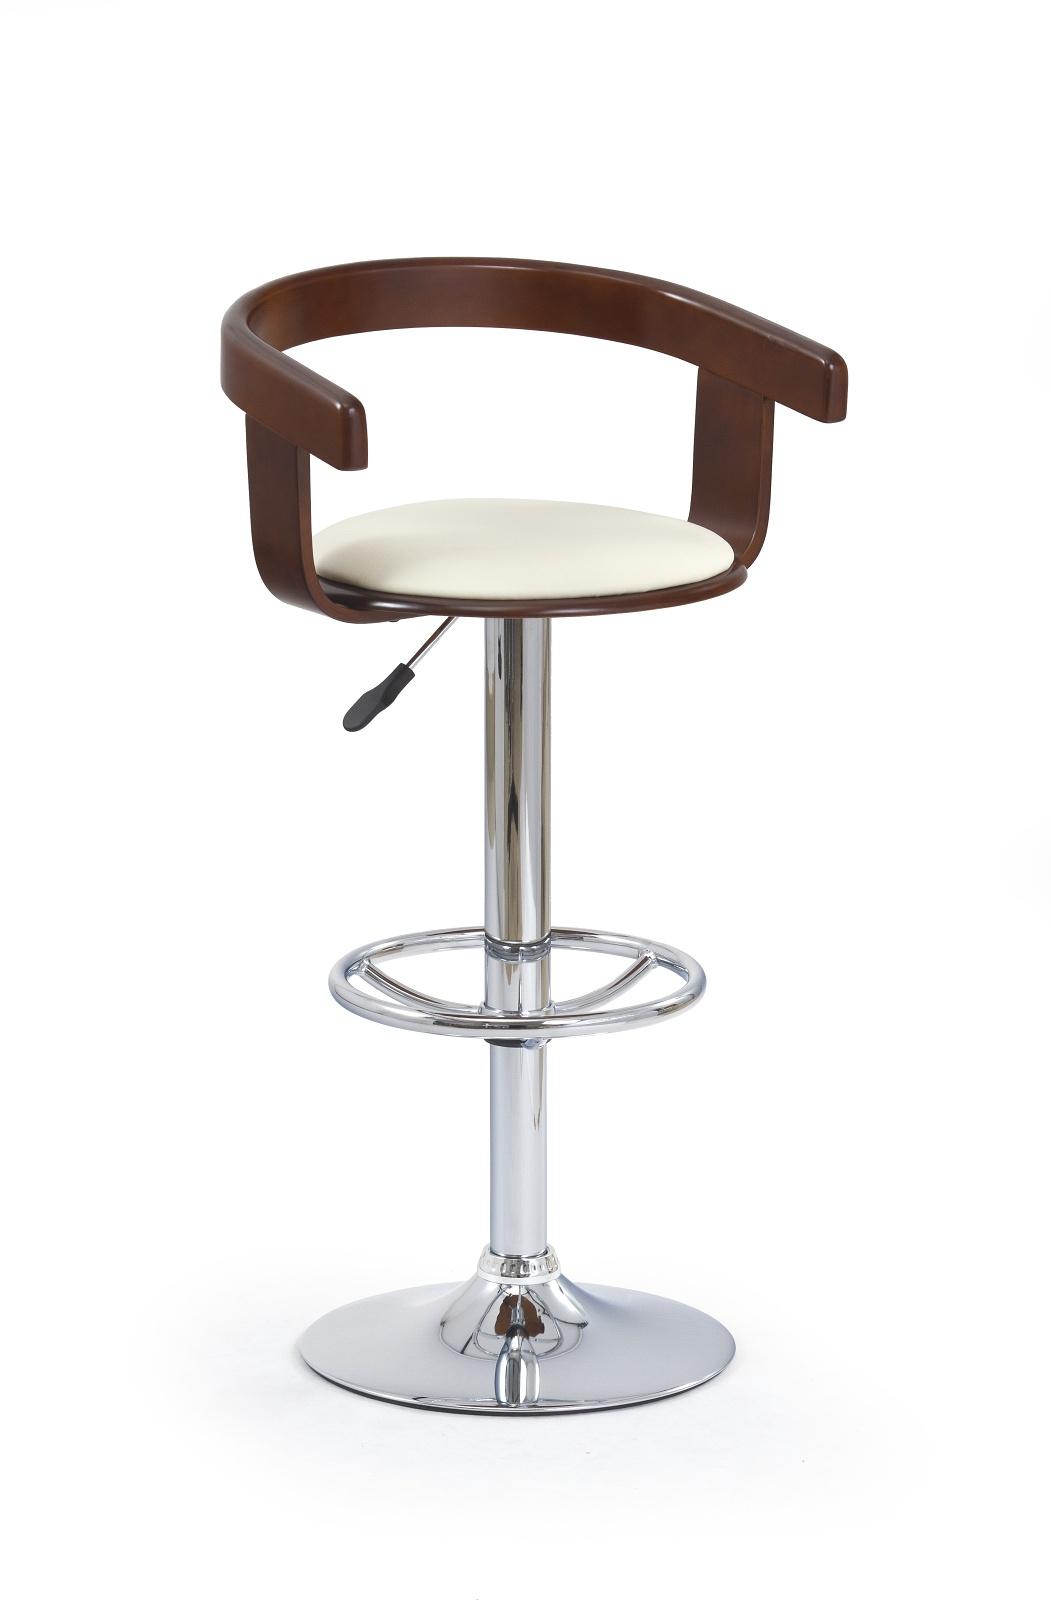 Barov� stoli�ka - Halmar - H-8 �ere��a antick� + B�